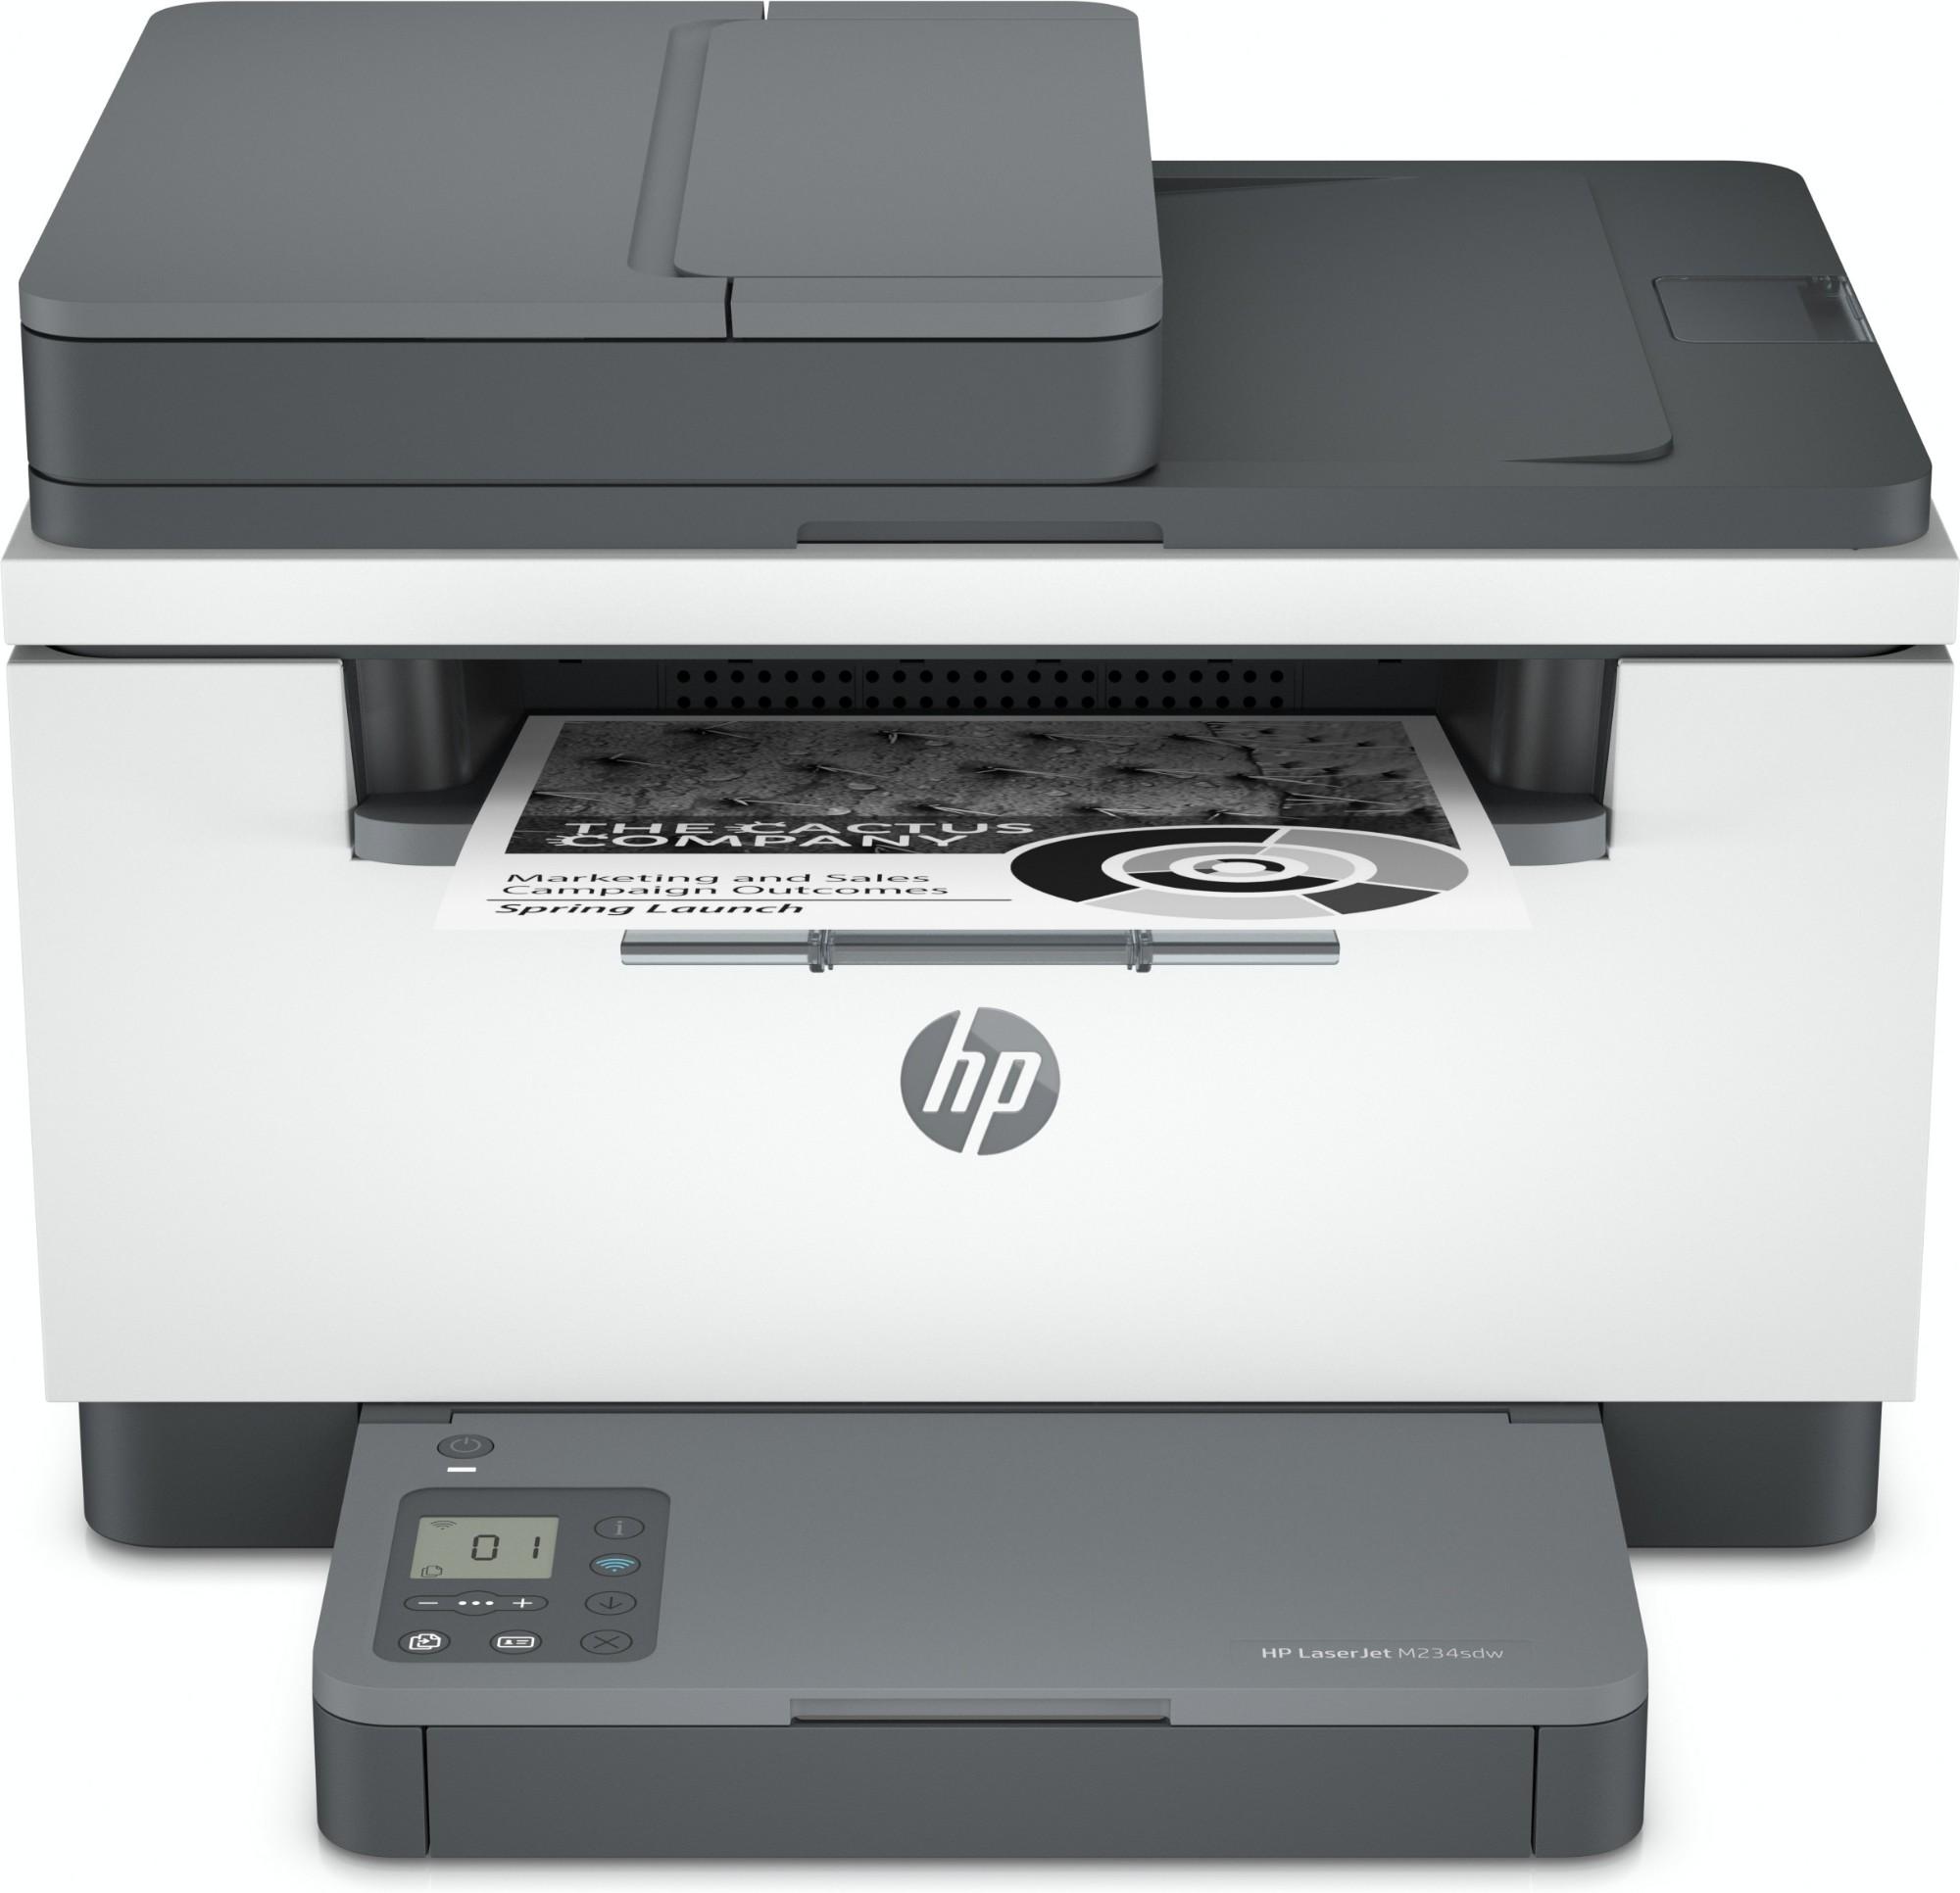 HP LaserJet M234sdw Laser A4 600 x 600 DPI 29 ppm Wi-Fi